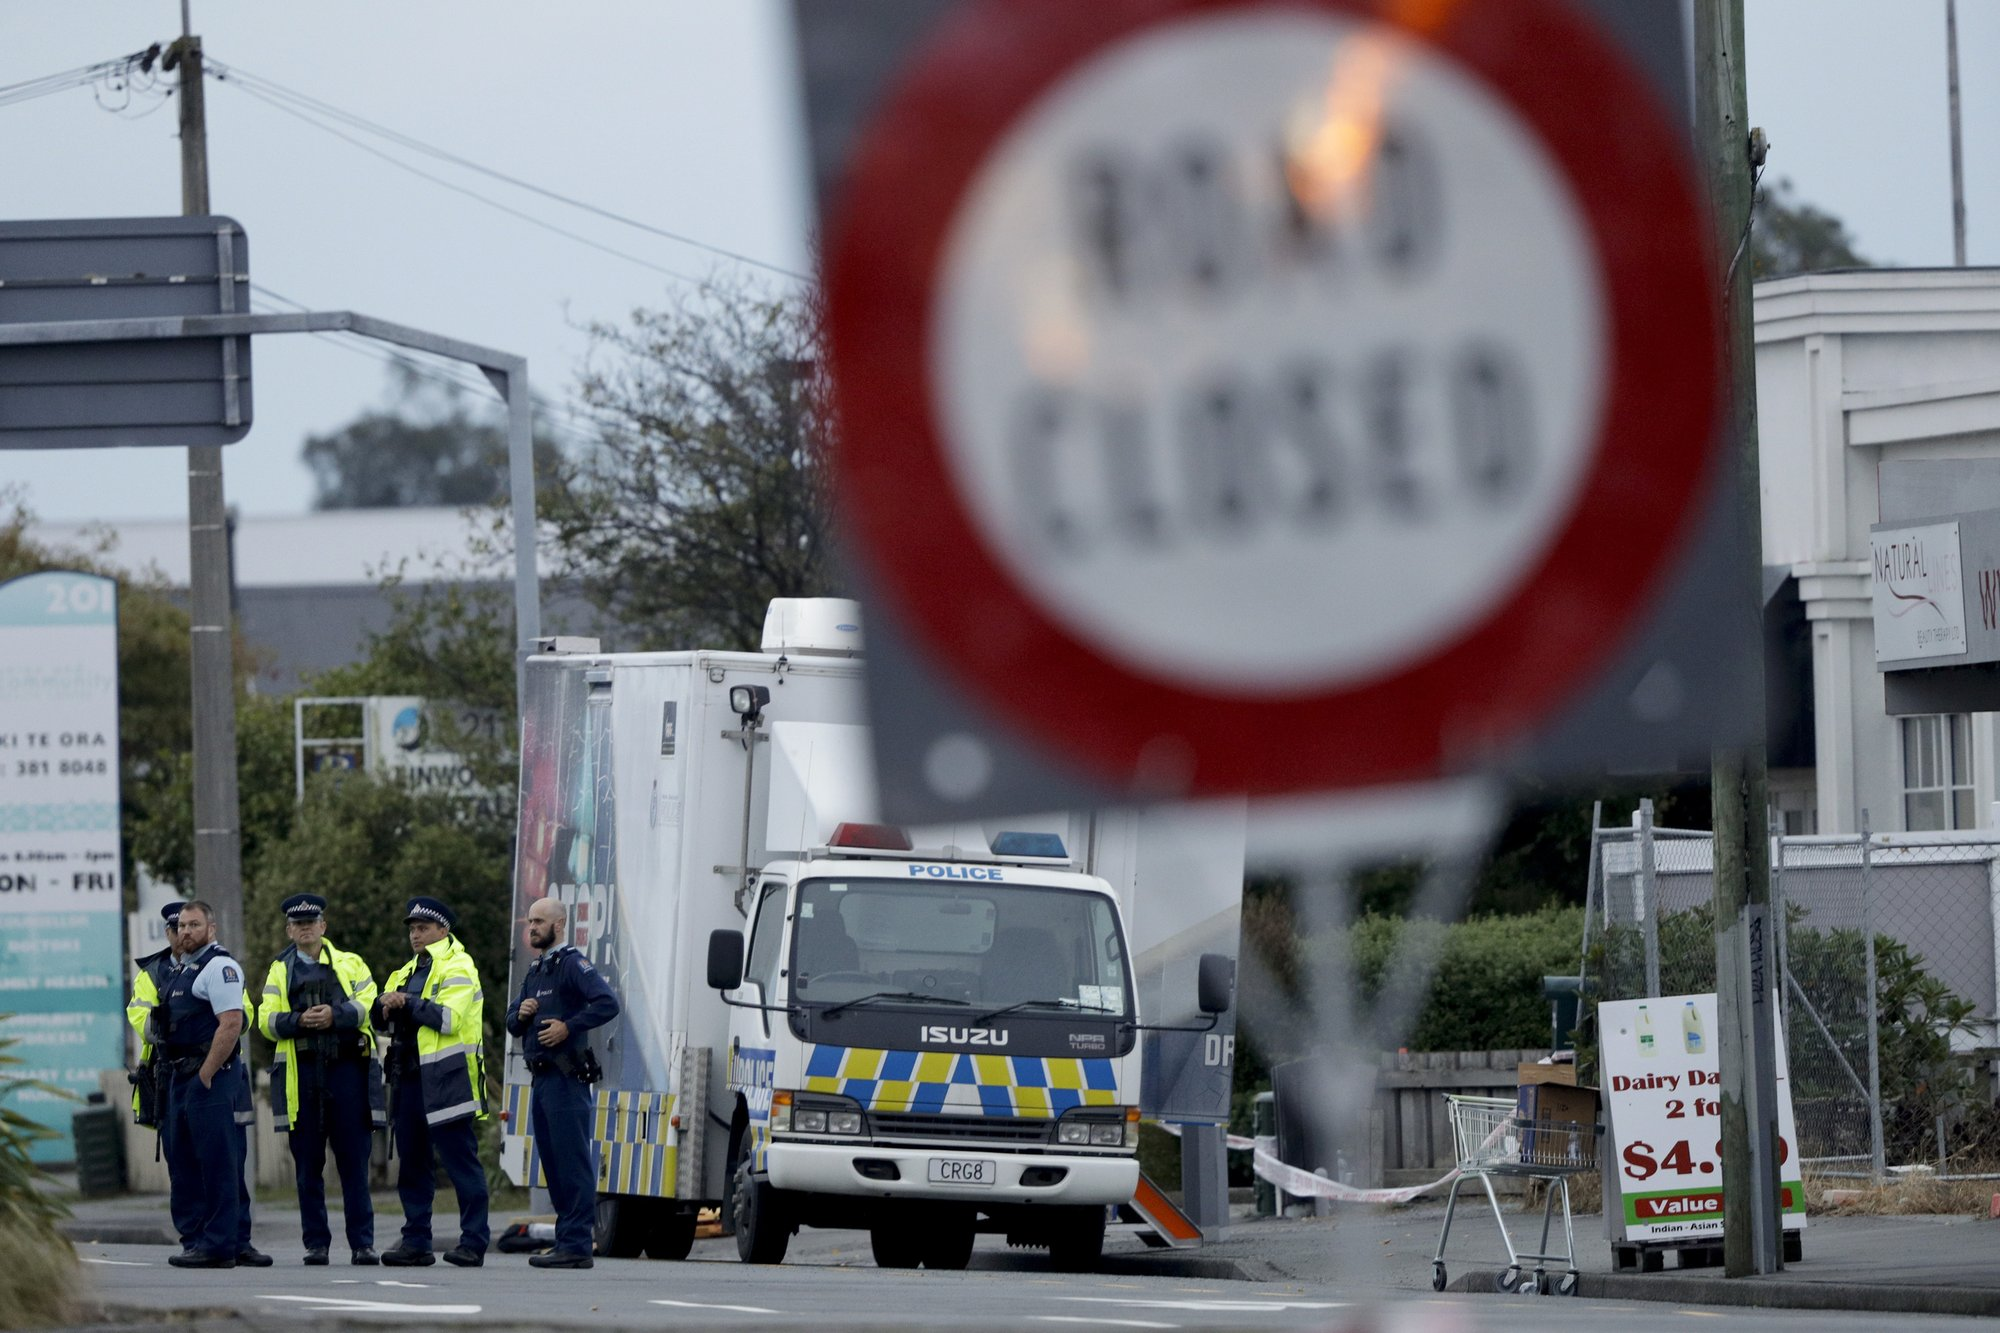 Yemen condemns deadly New Zealand mosque attacks